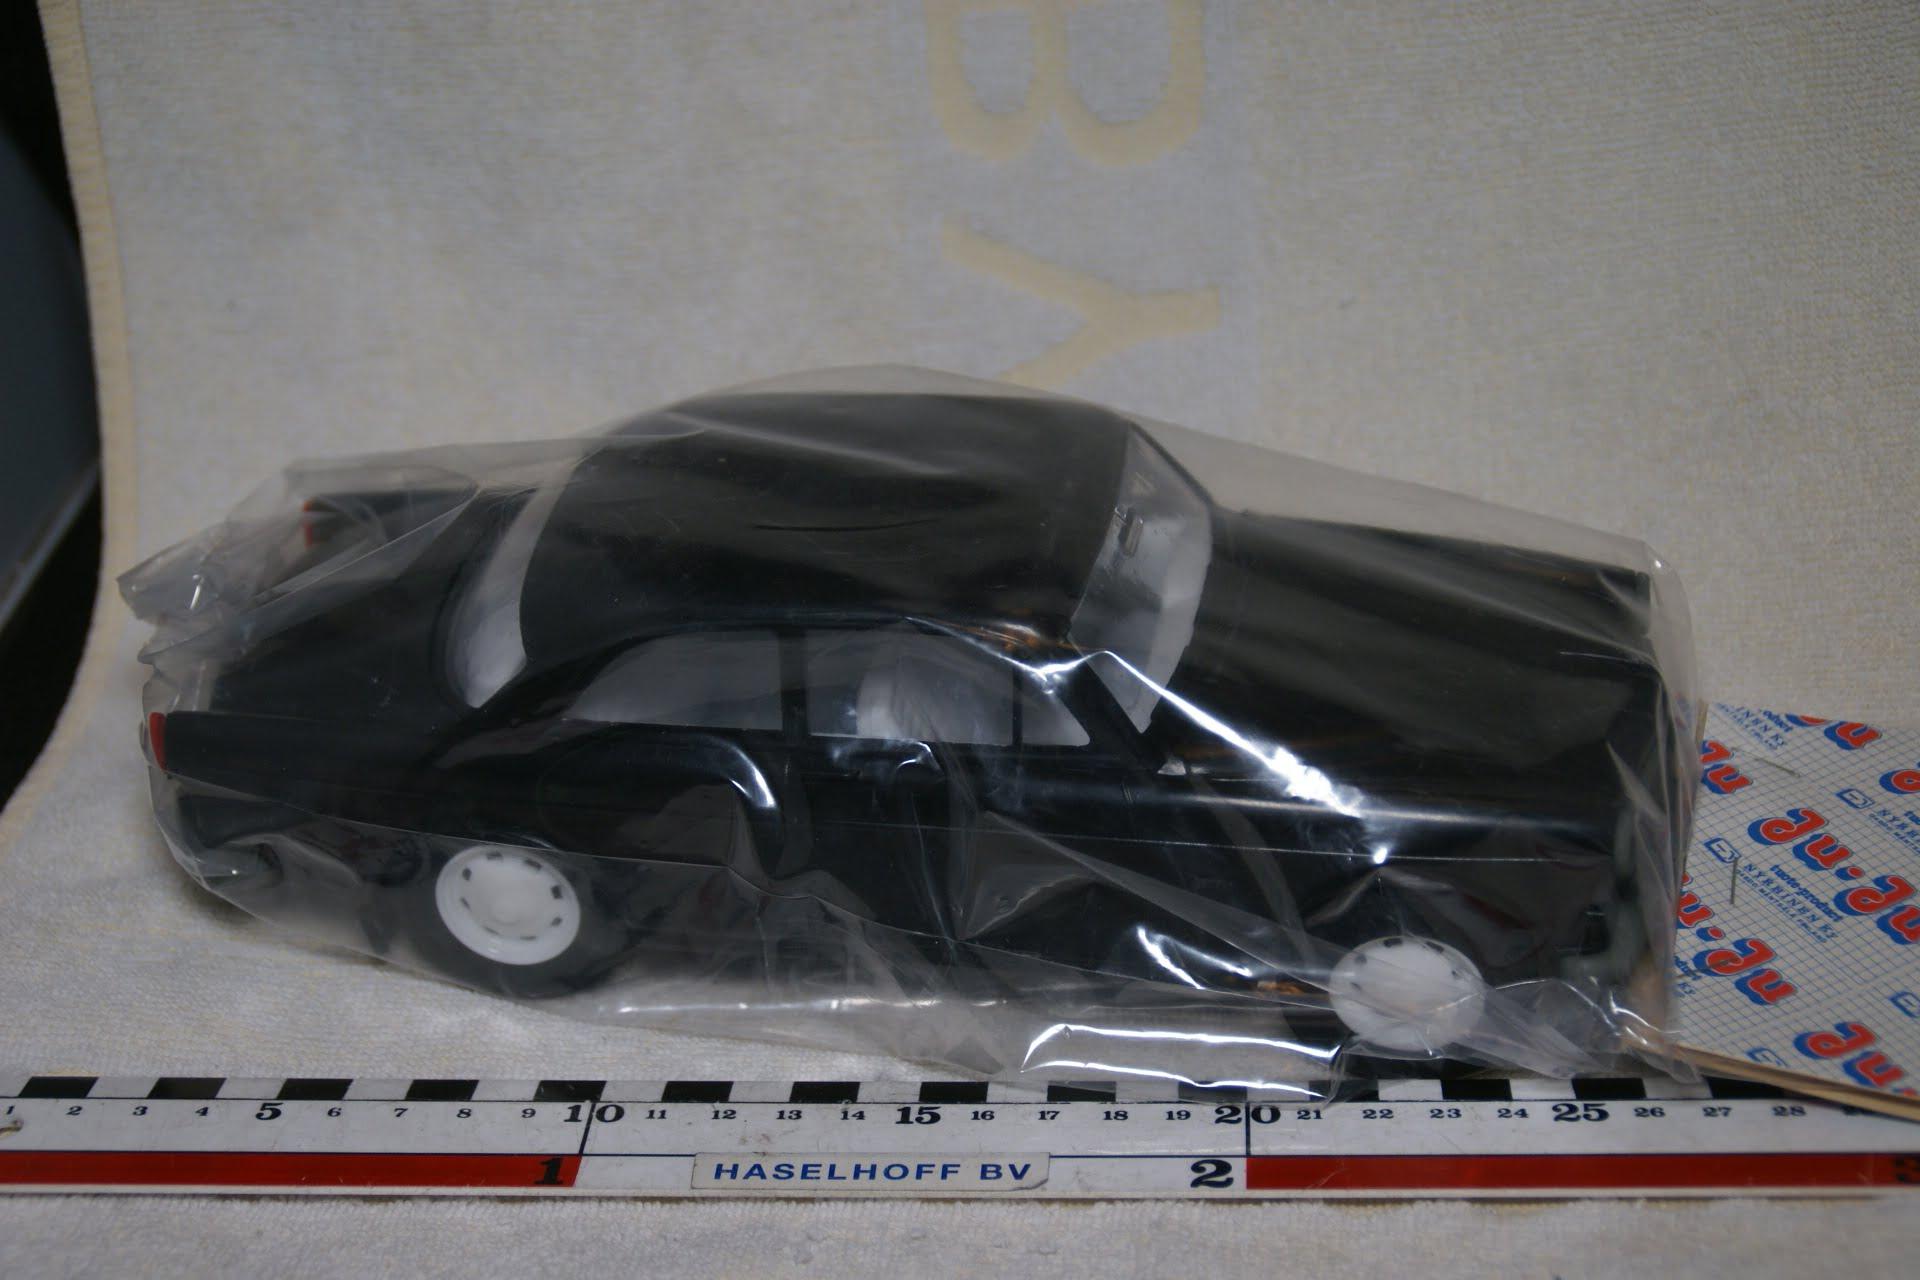 DSC08985 miniatuur Volvo Amazon 130 zwart ca 1op18 JuJu Stahlberg Finland MB